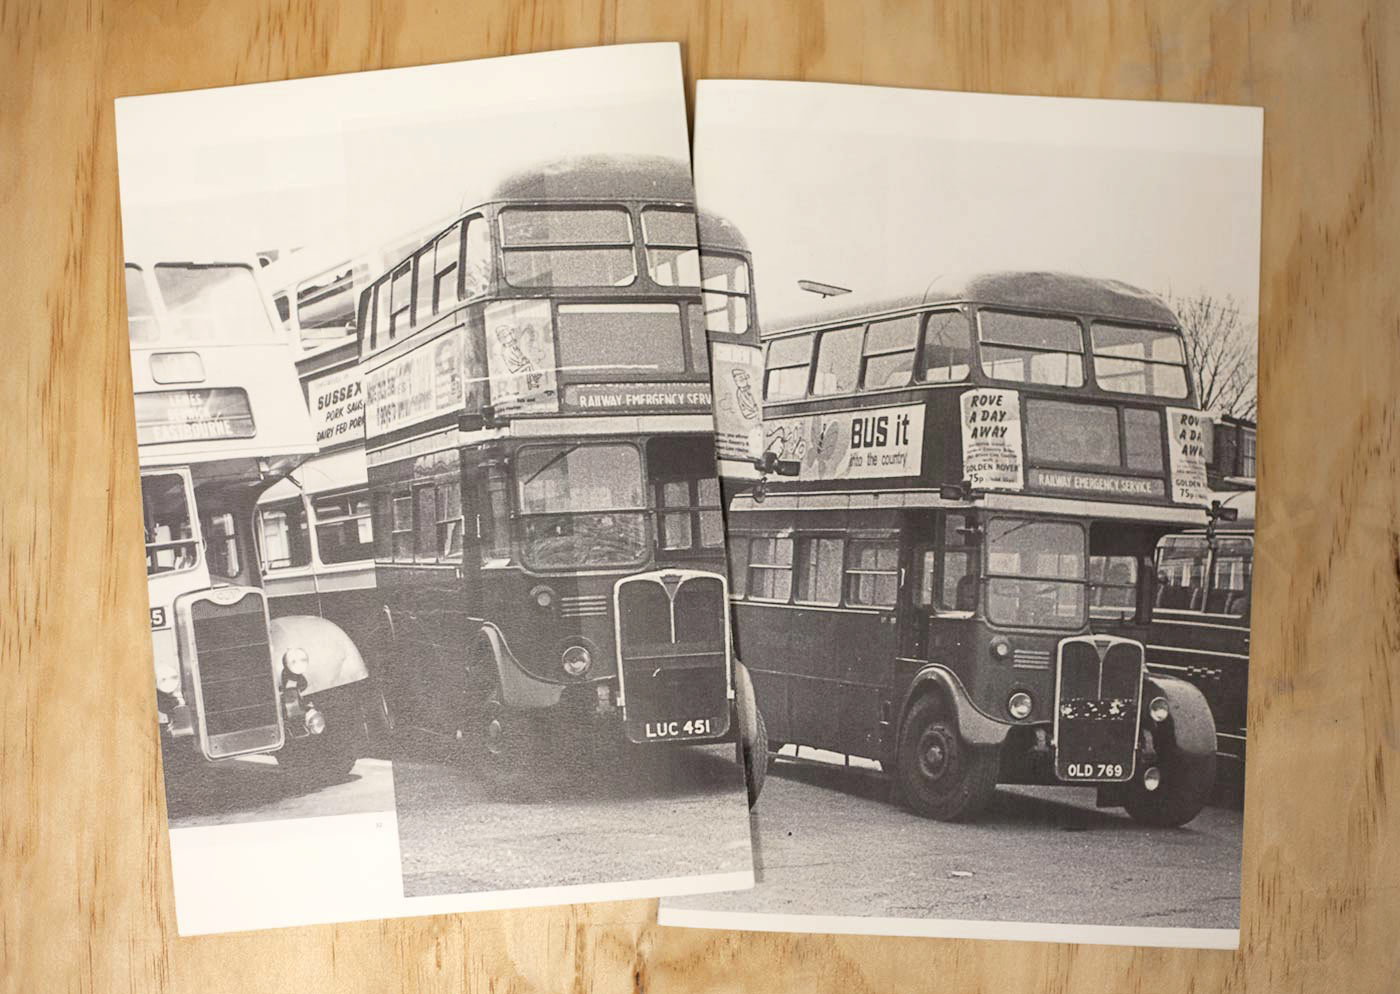 paula-roush-bus-spotting-photobook-msdm-publications-orphan1-147